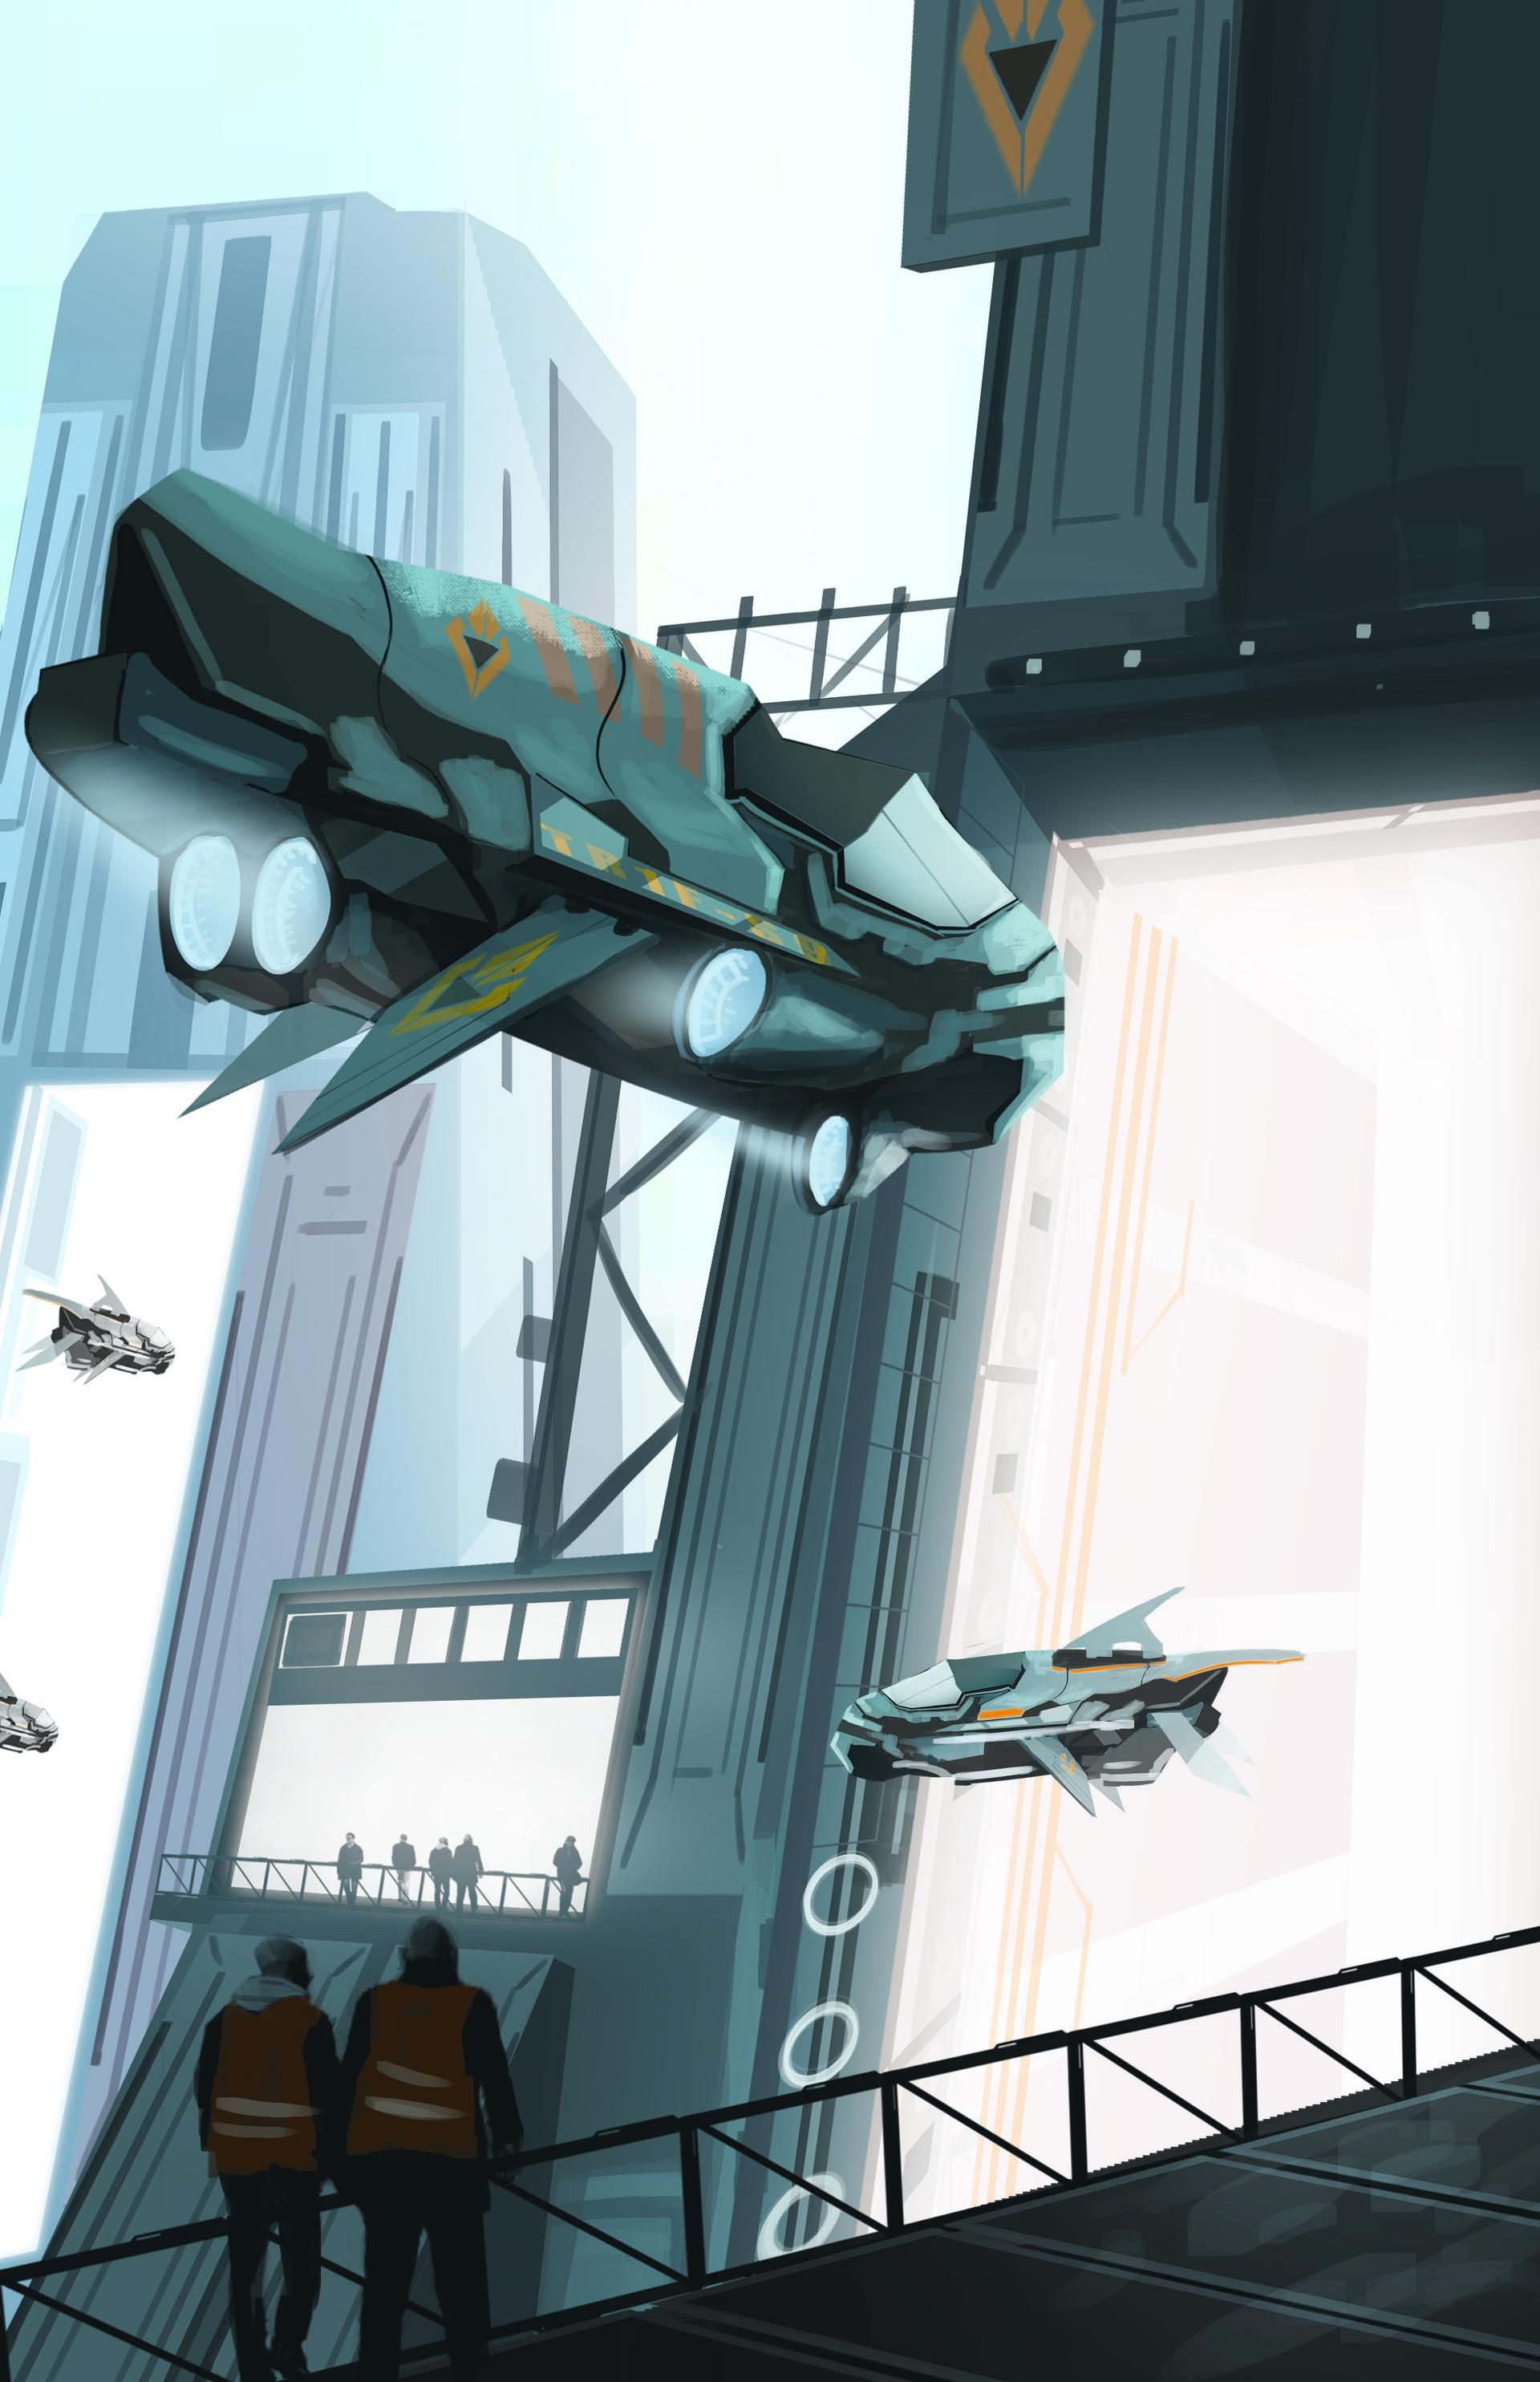 Jack dowell landing dock 06